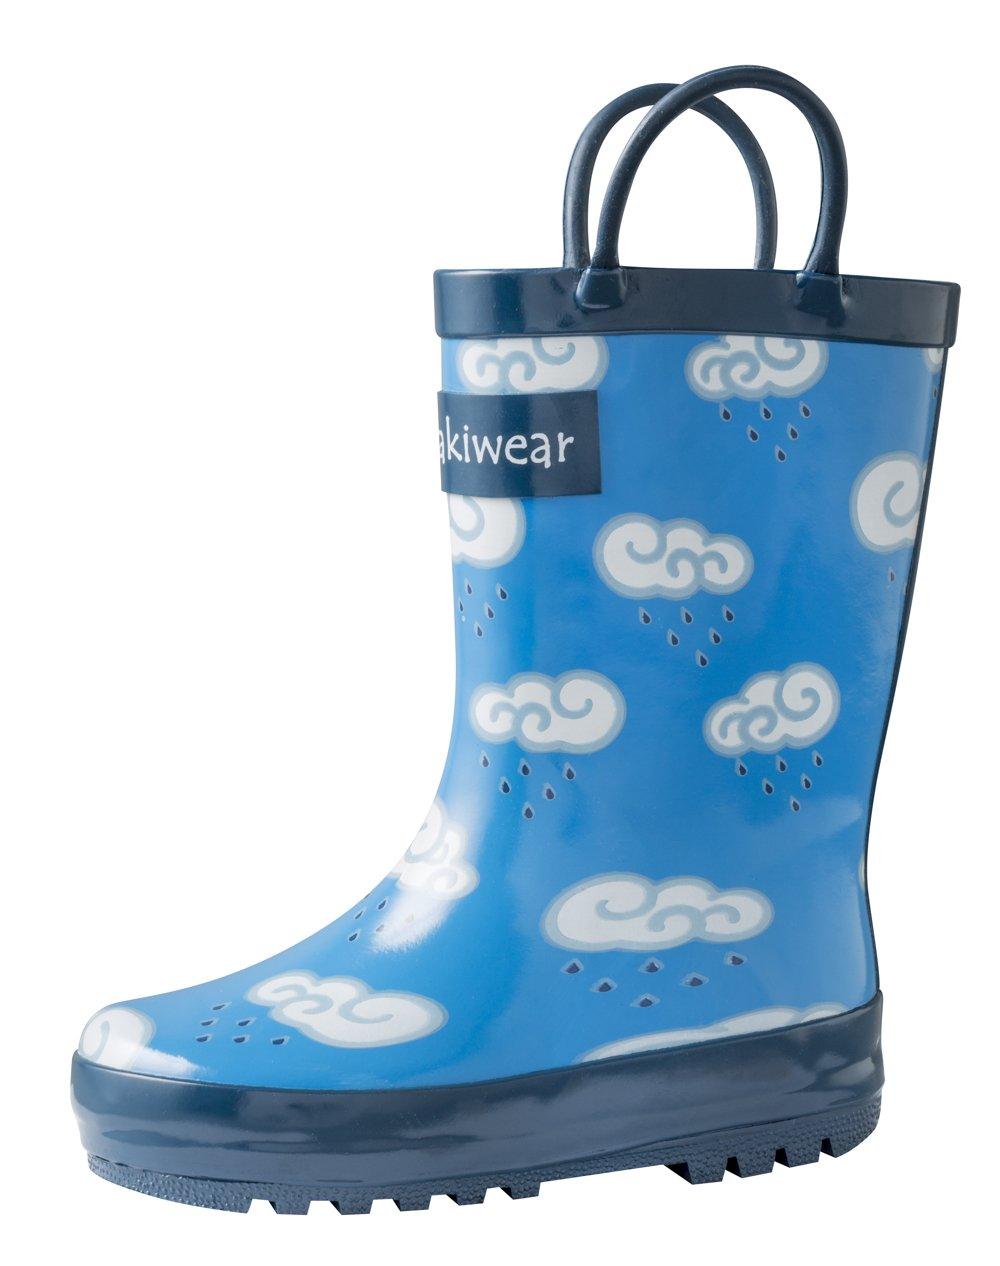 Oakiwear Kids Rubber Rain Boots with Easy-On Handles, Clouds, 9T US Toddler by Oakiwear (Image #3)